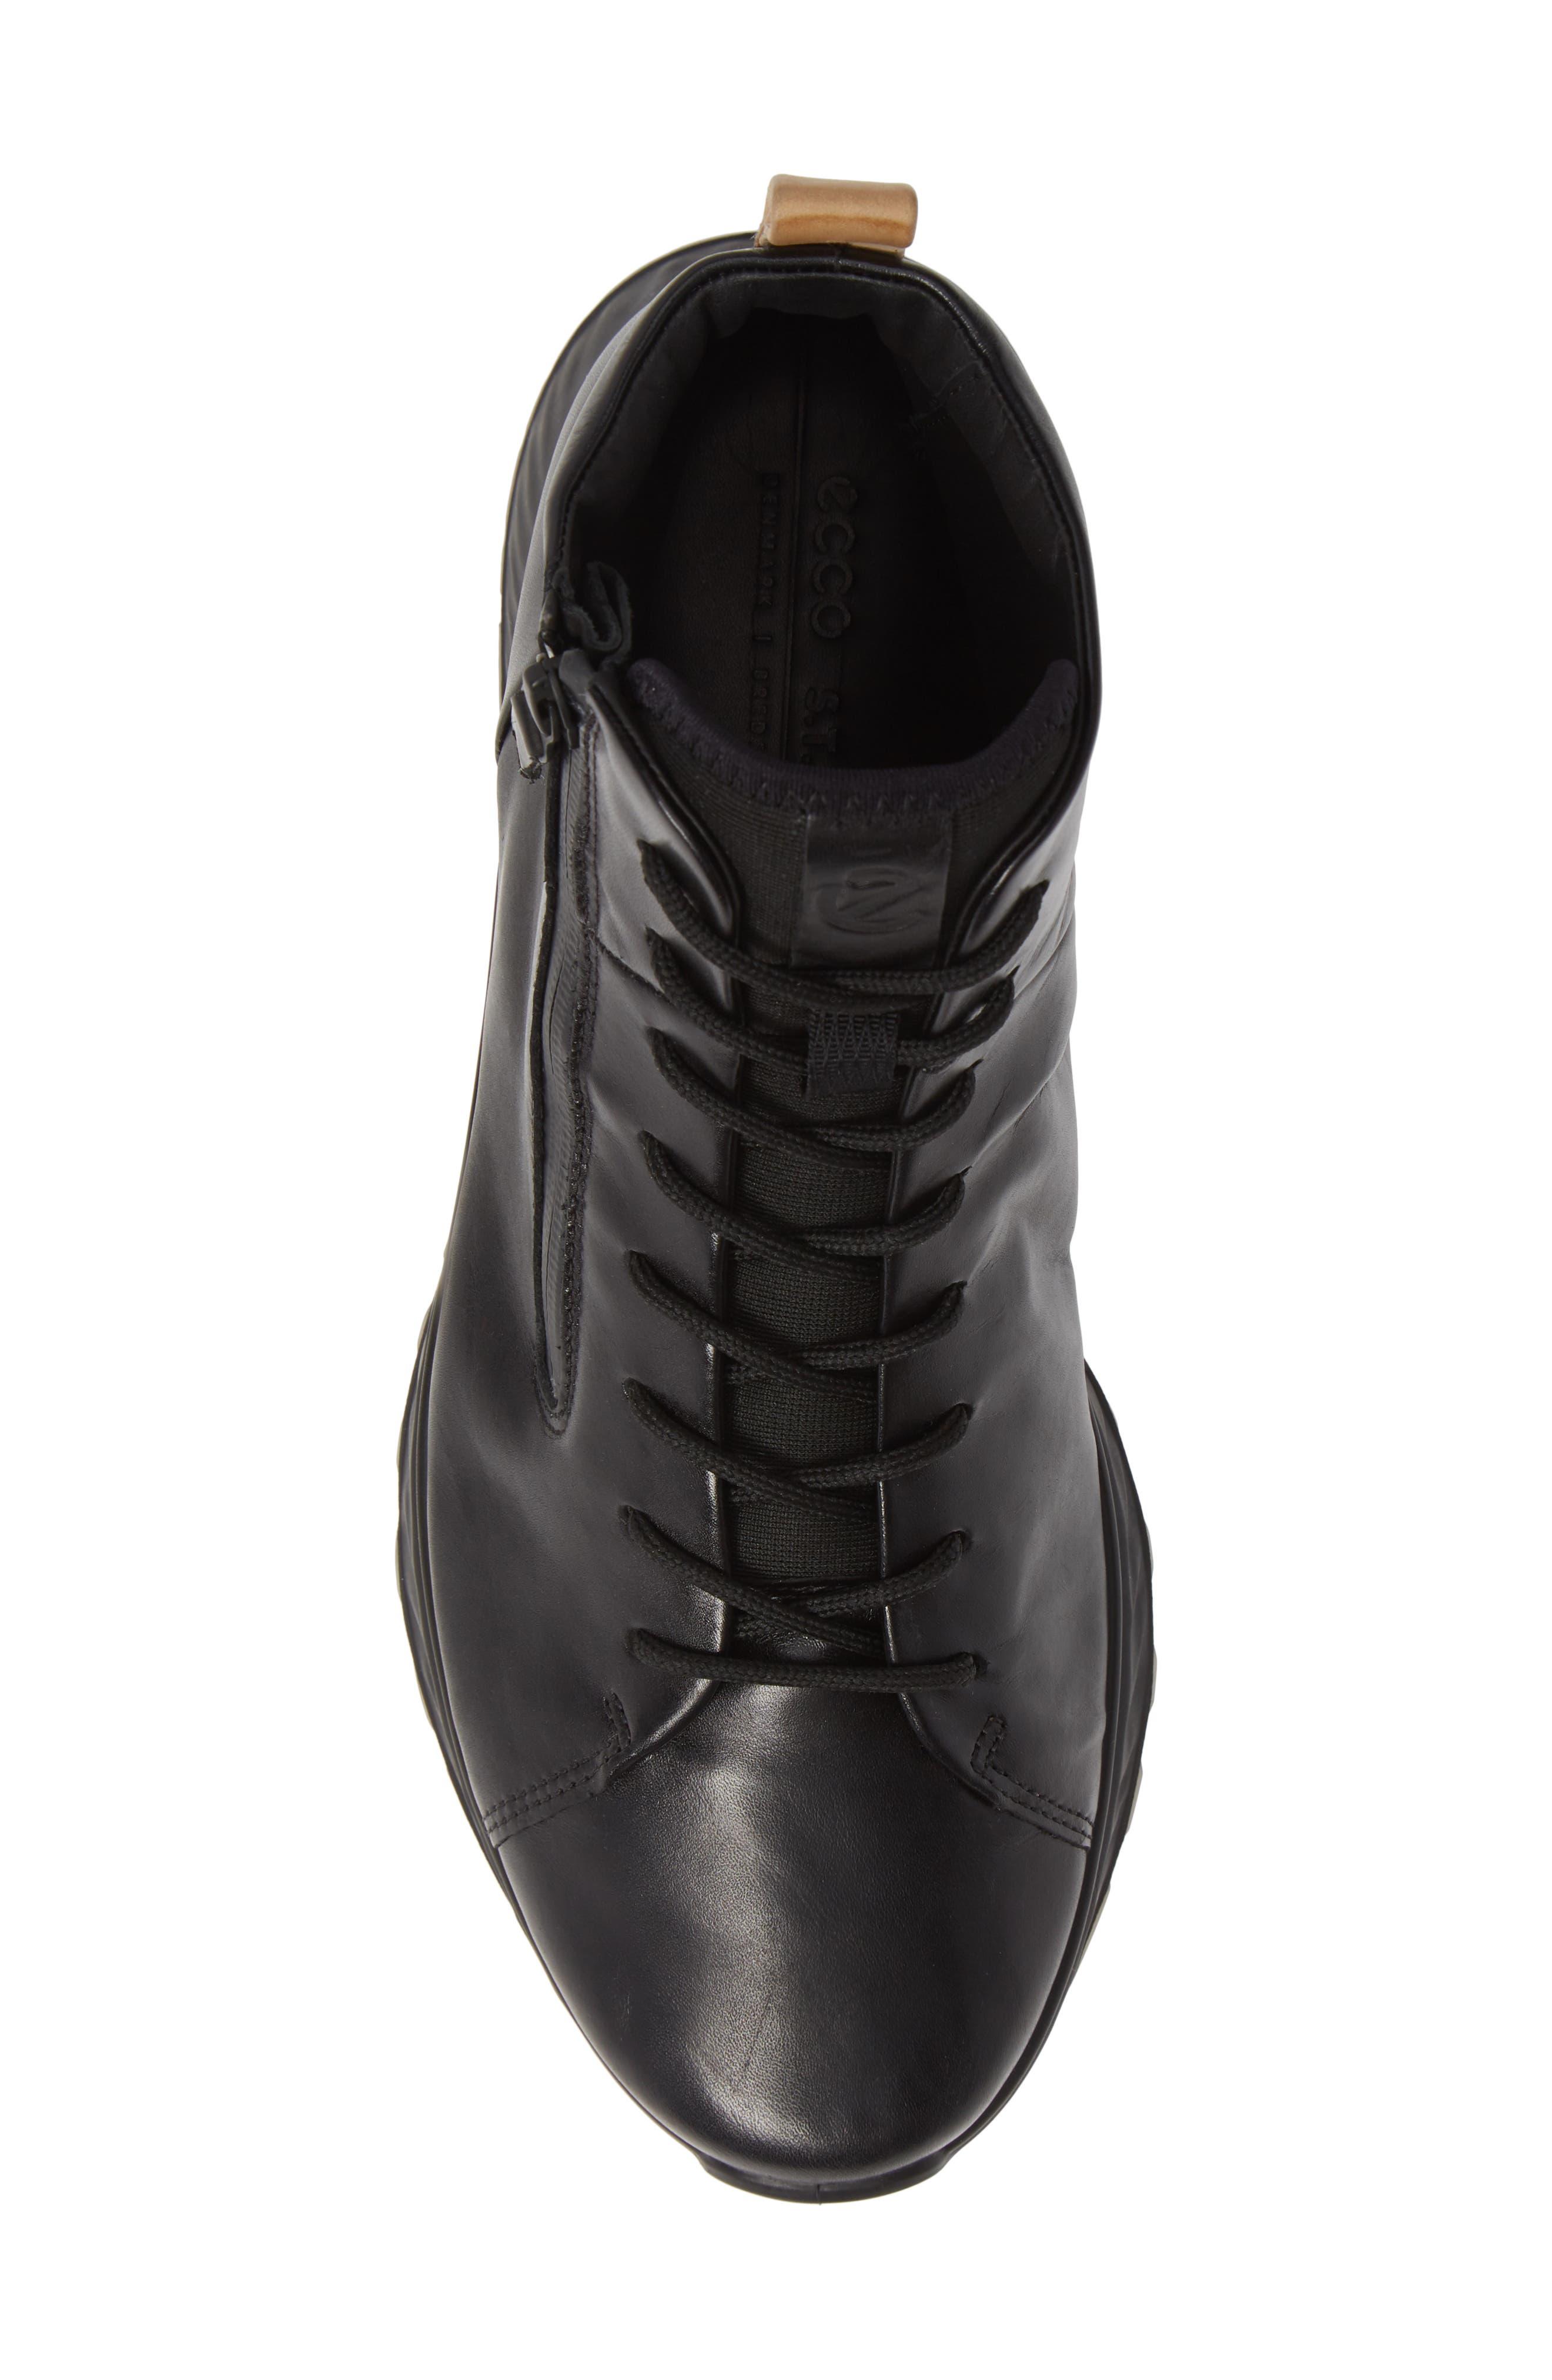 ST1 High Top Sneaker,                             Alternate thumbnail 5, color,                             BLACK/BLACK LEATHER